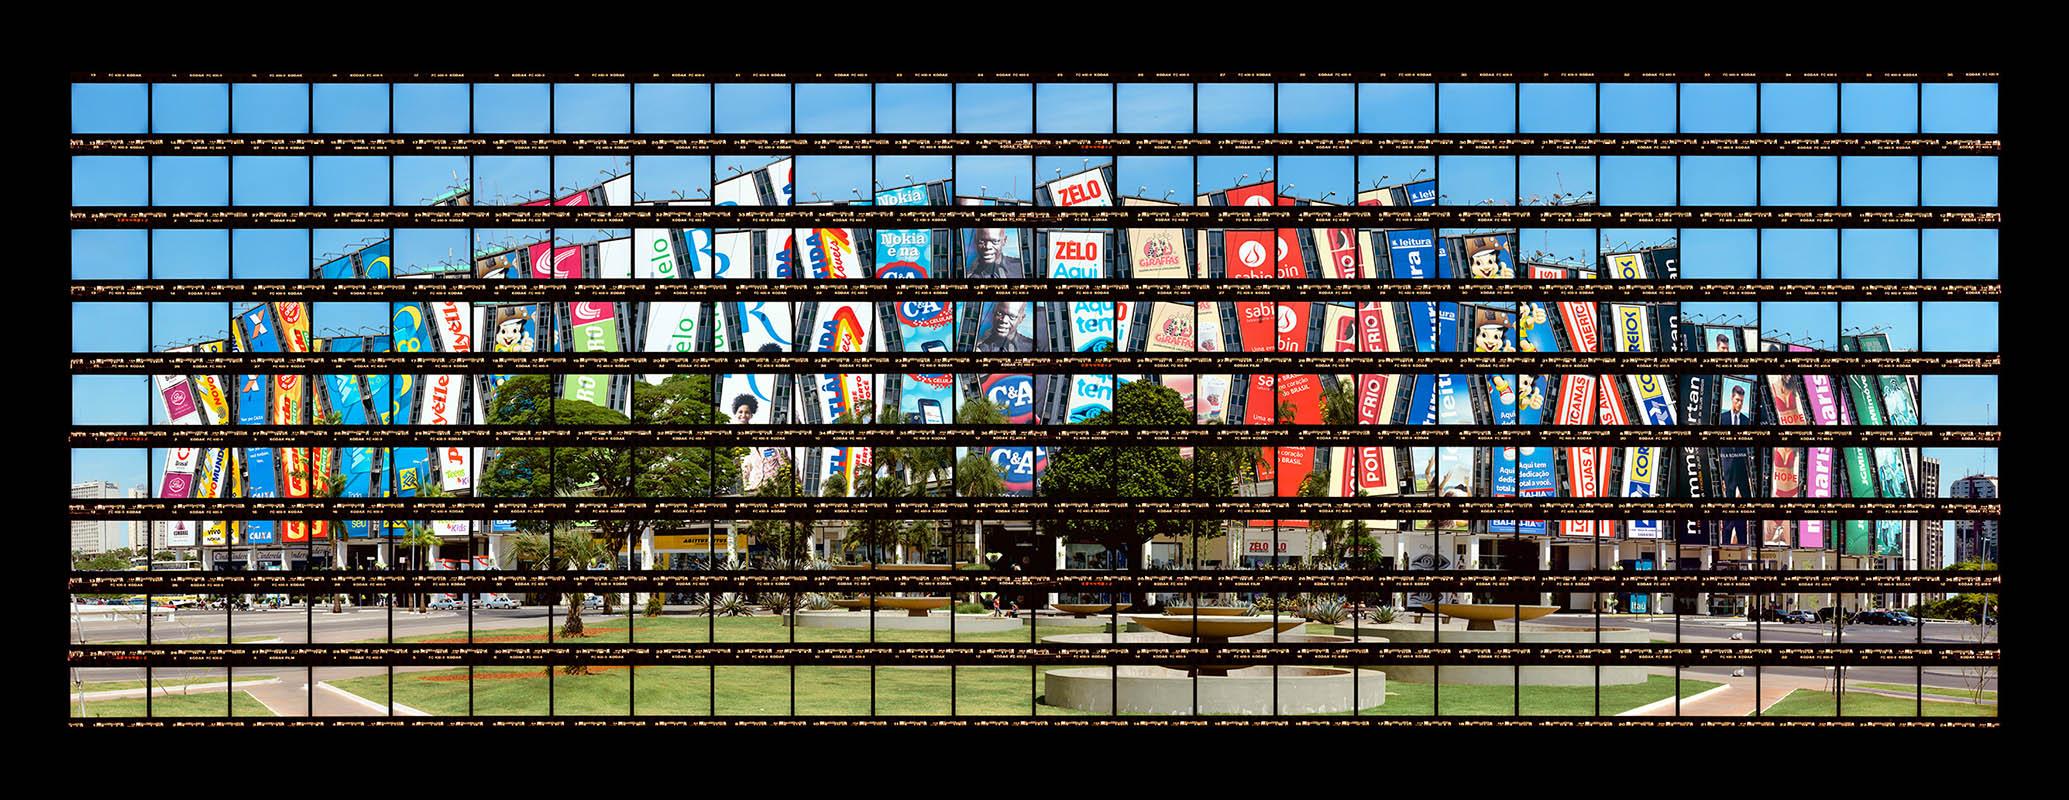 Gab Arte k2o art Thomas Kellner.Shopping Conjunto Nacional, Nauro Jorge Esteves.Brasília, Brasil.58x150cm.2008